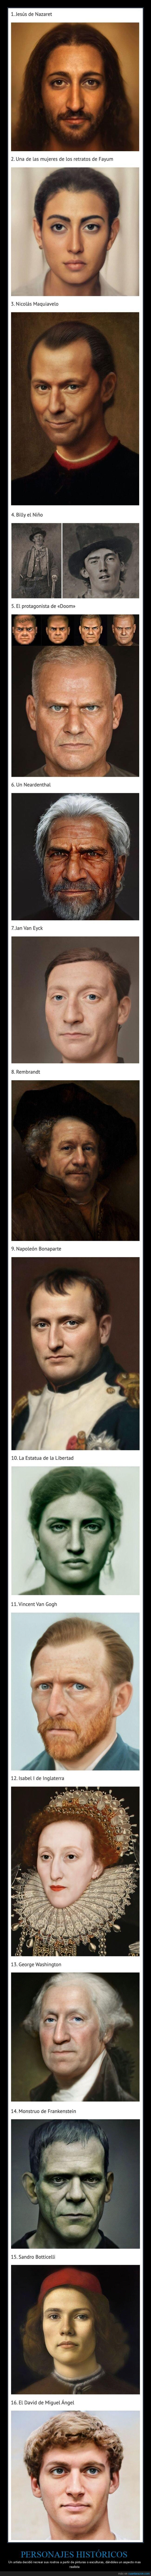 aspecto,caras,personajes históricos,recreación